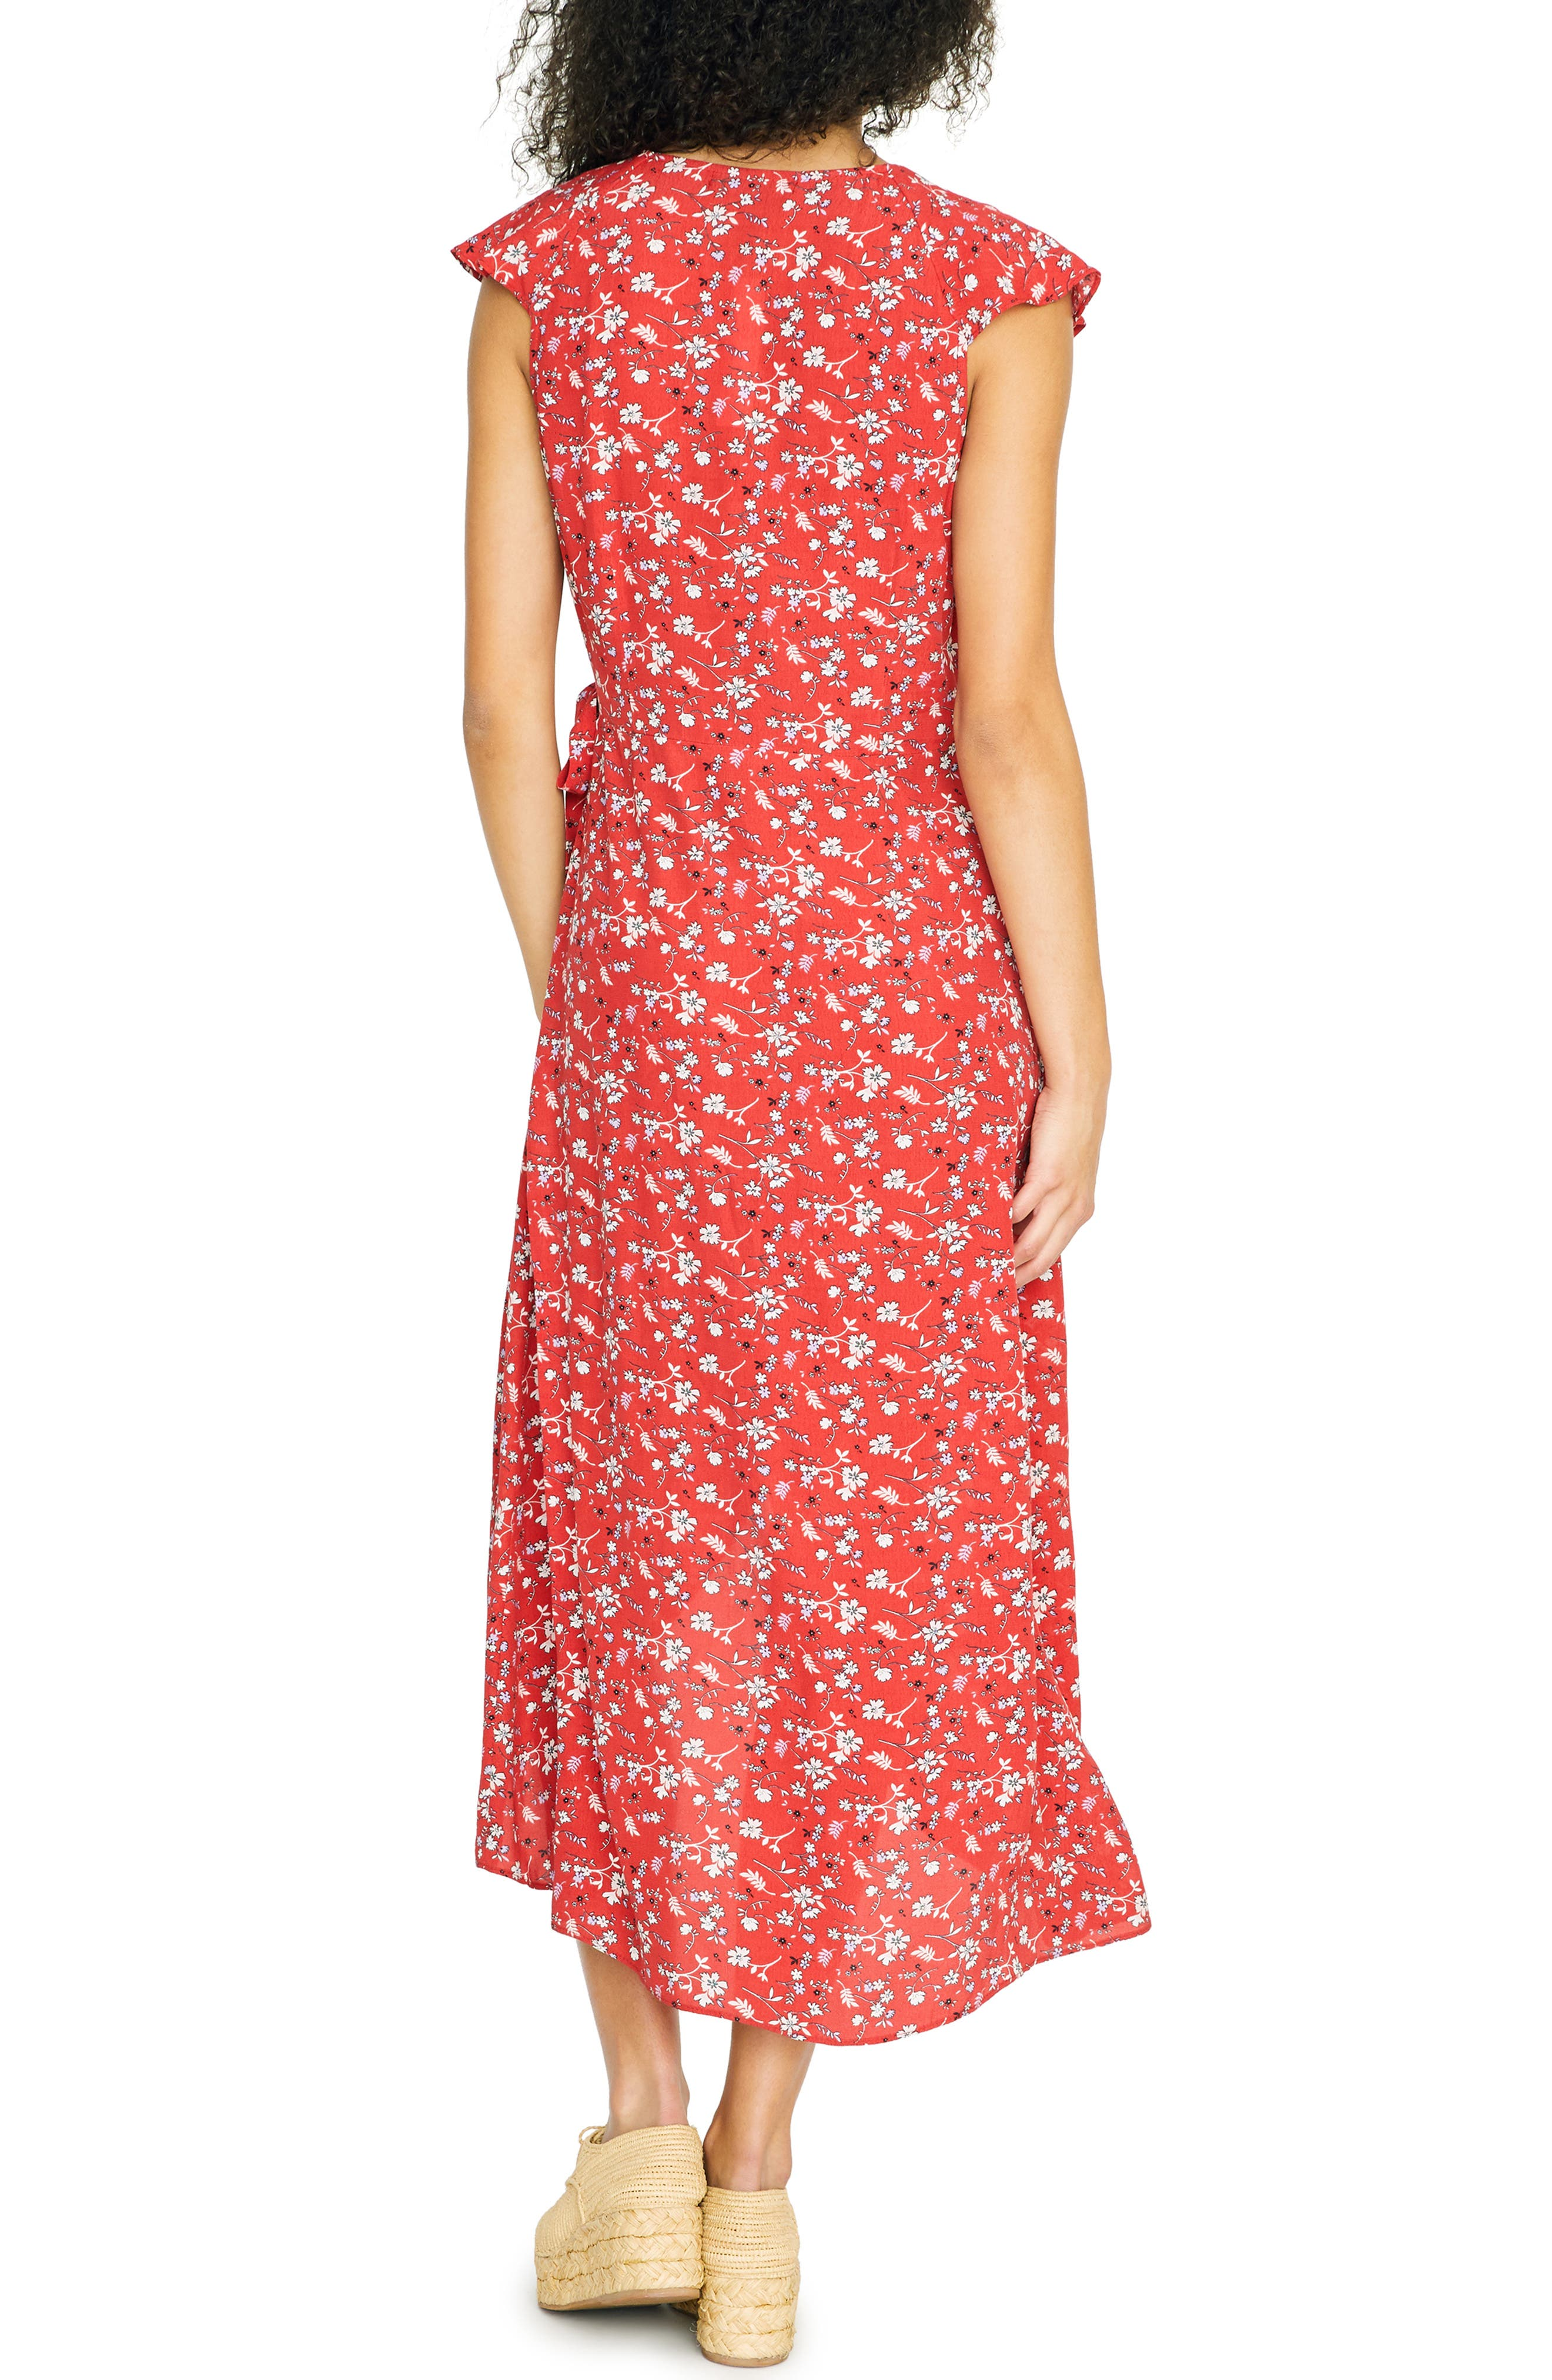 SANCTUARY, Jolynn Faux Wrap Midi Dress, Alternate thumbnail 2, color, SIMPLY RED